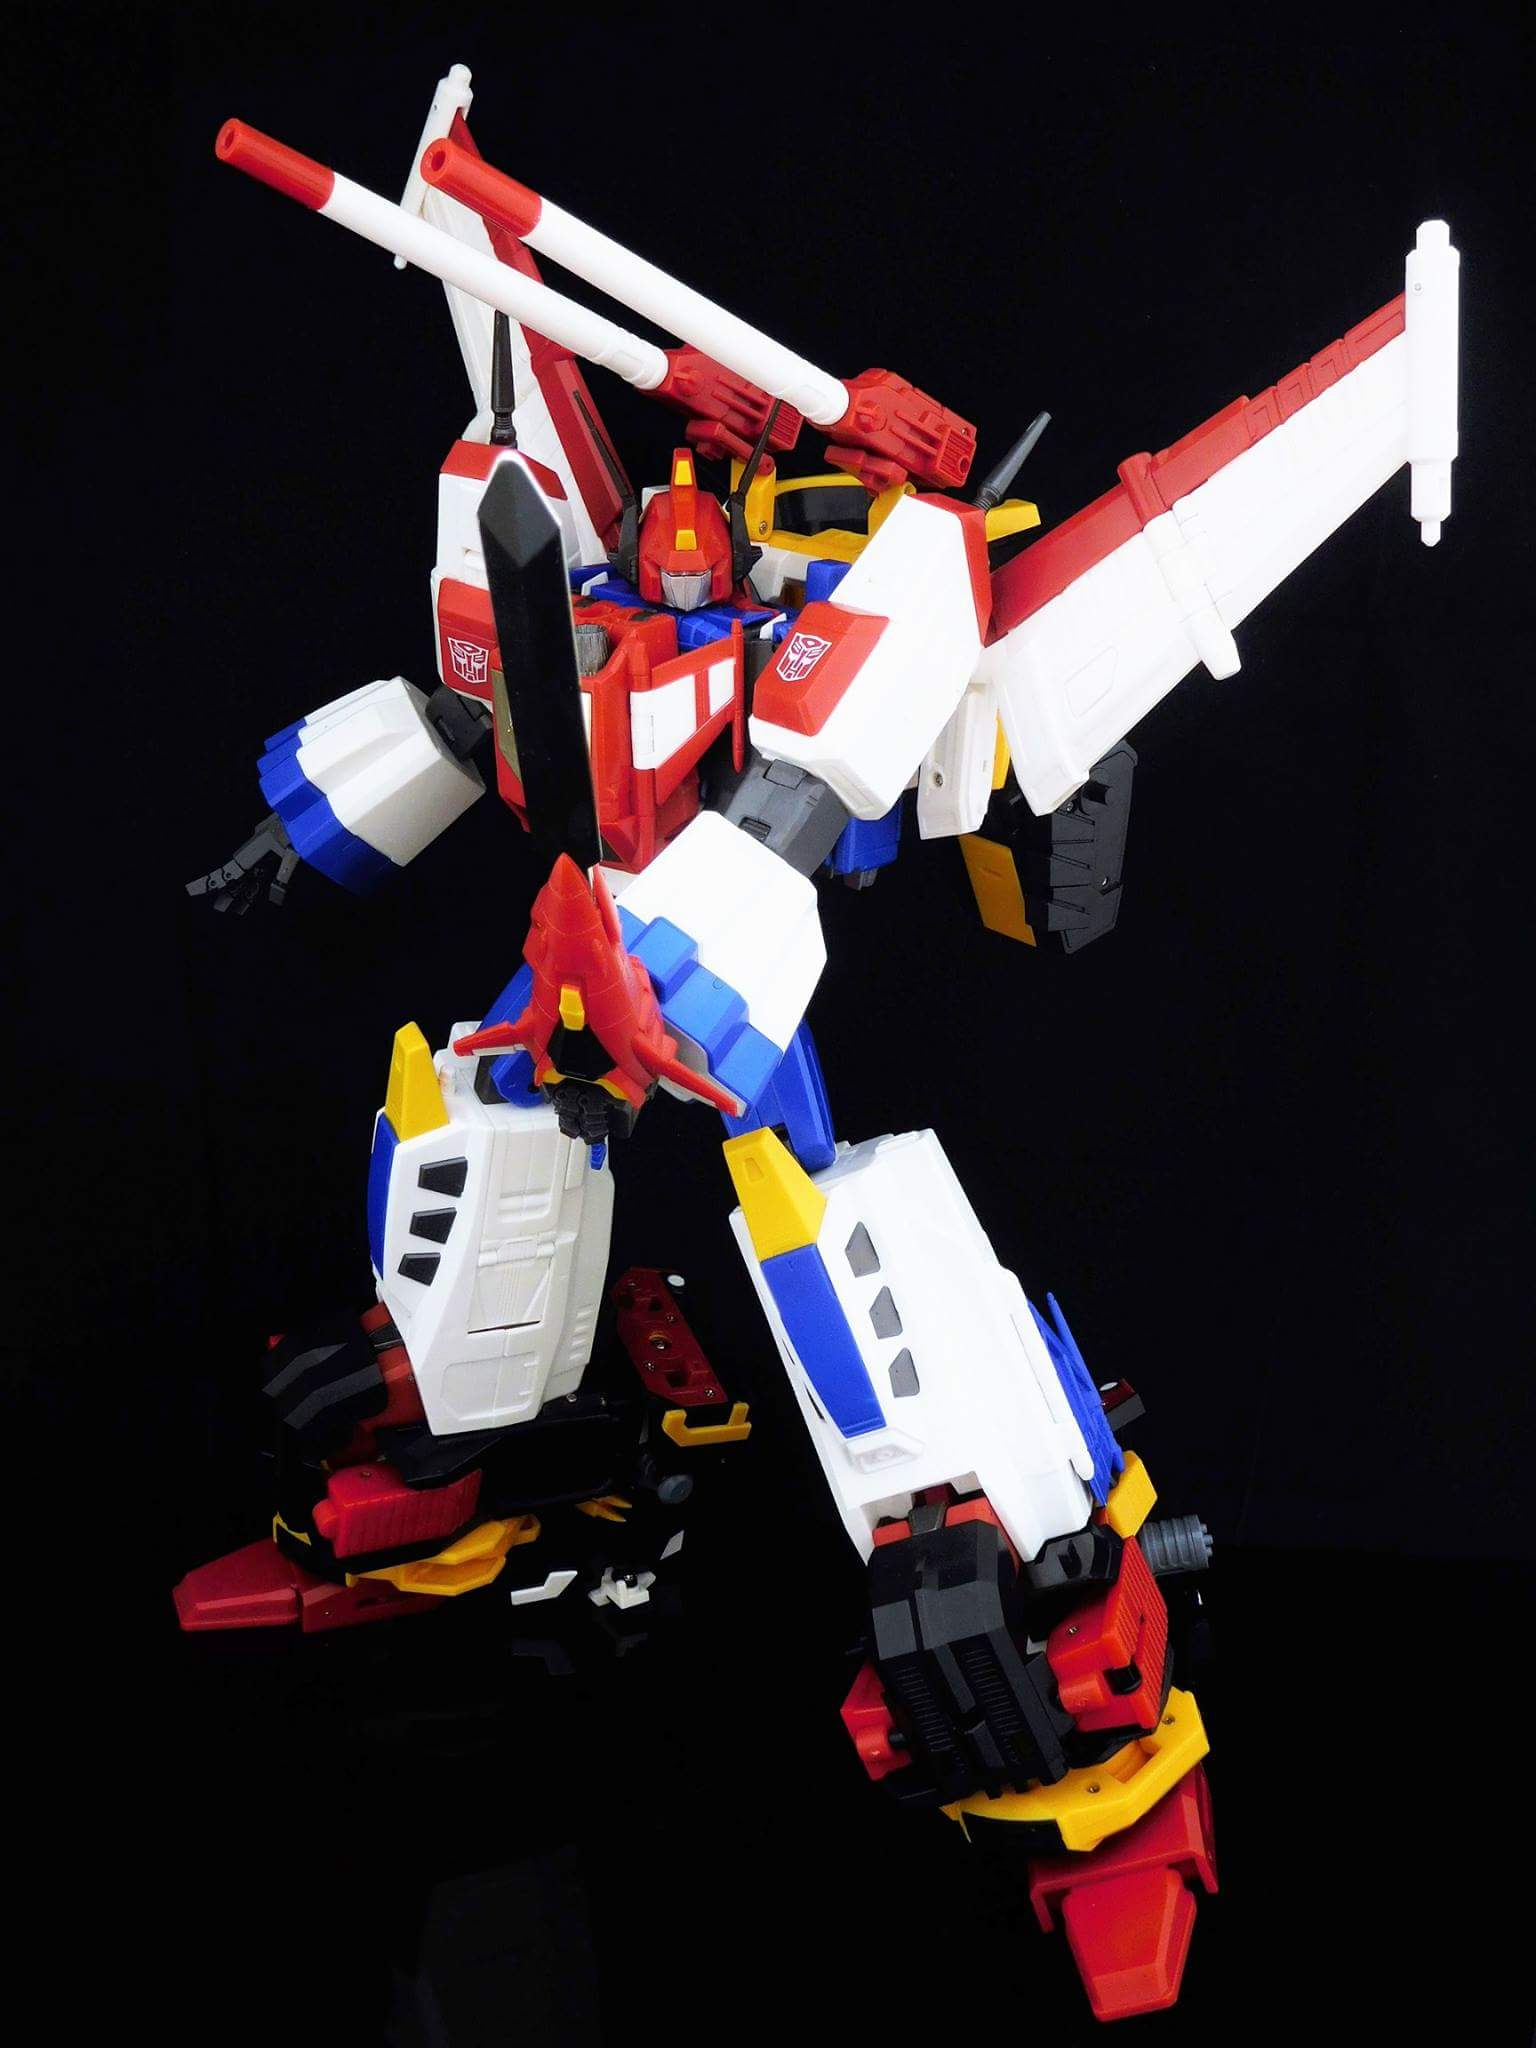 [KFC Toys] Produit Tiers - Jouet Phase 8-A Simba - aka Victory Leo (Transformers Victory) - Page 2 KkBWJobX